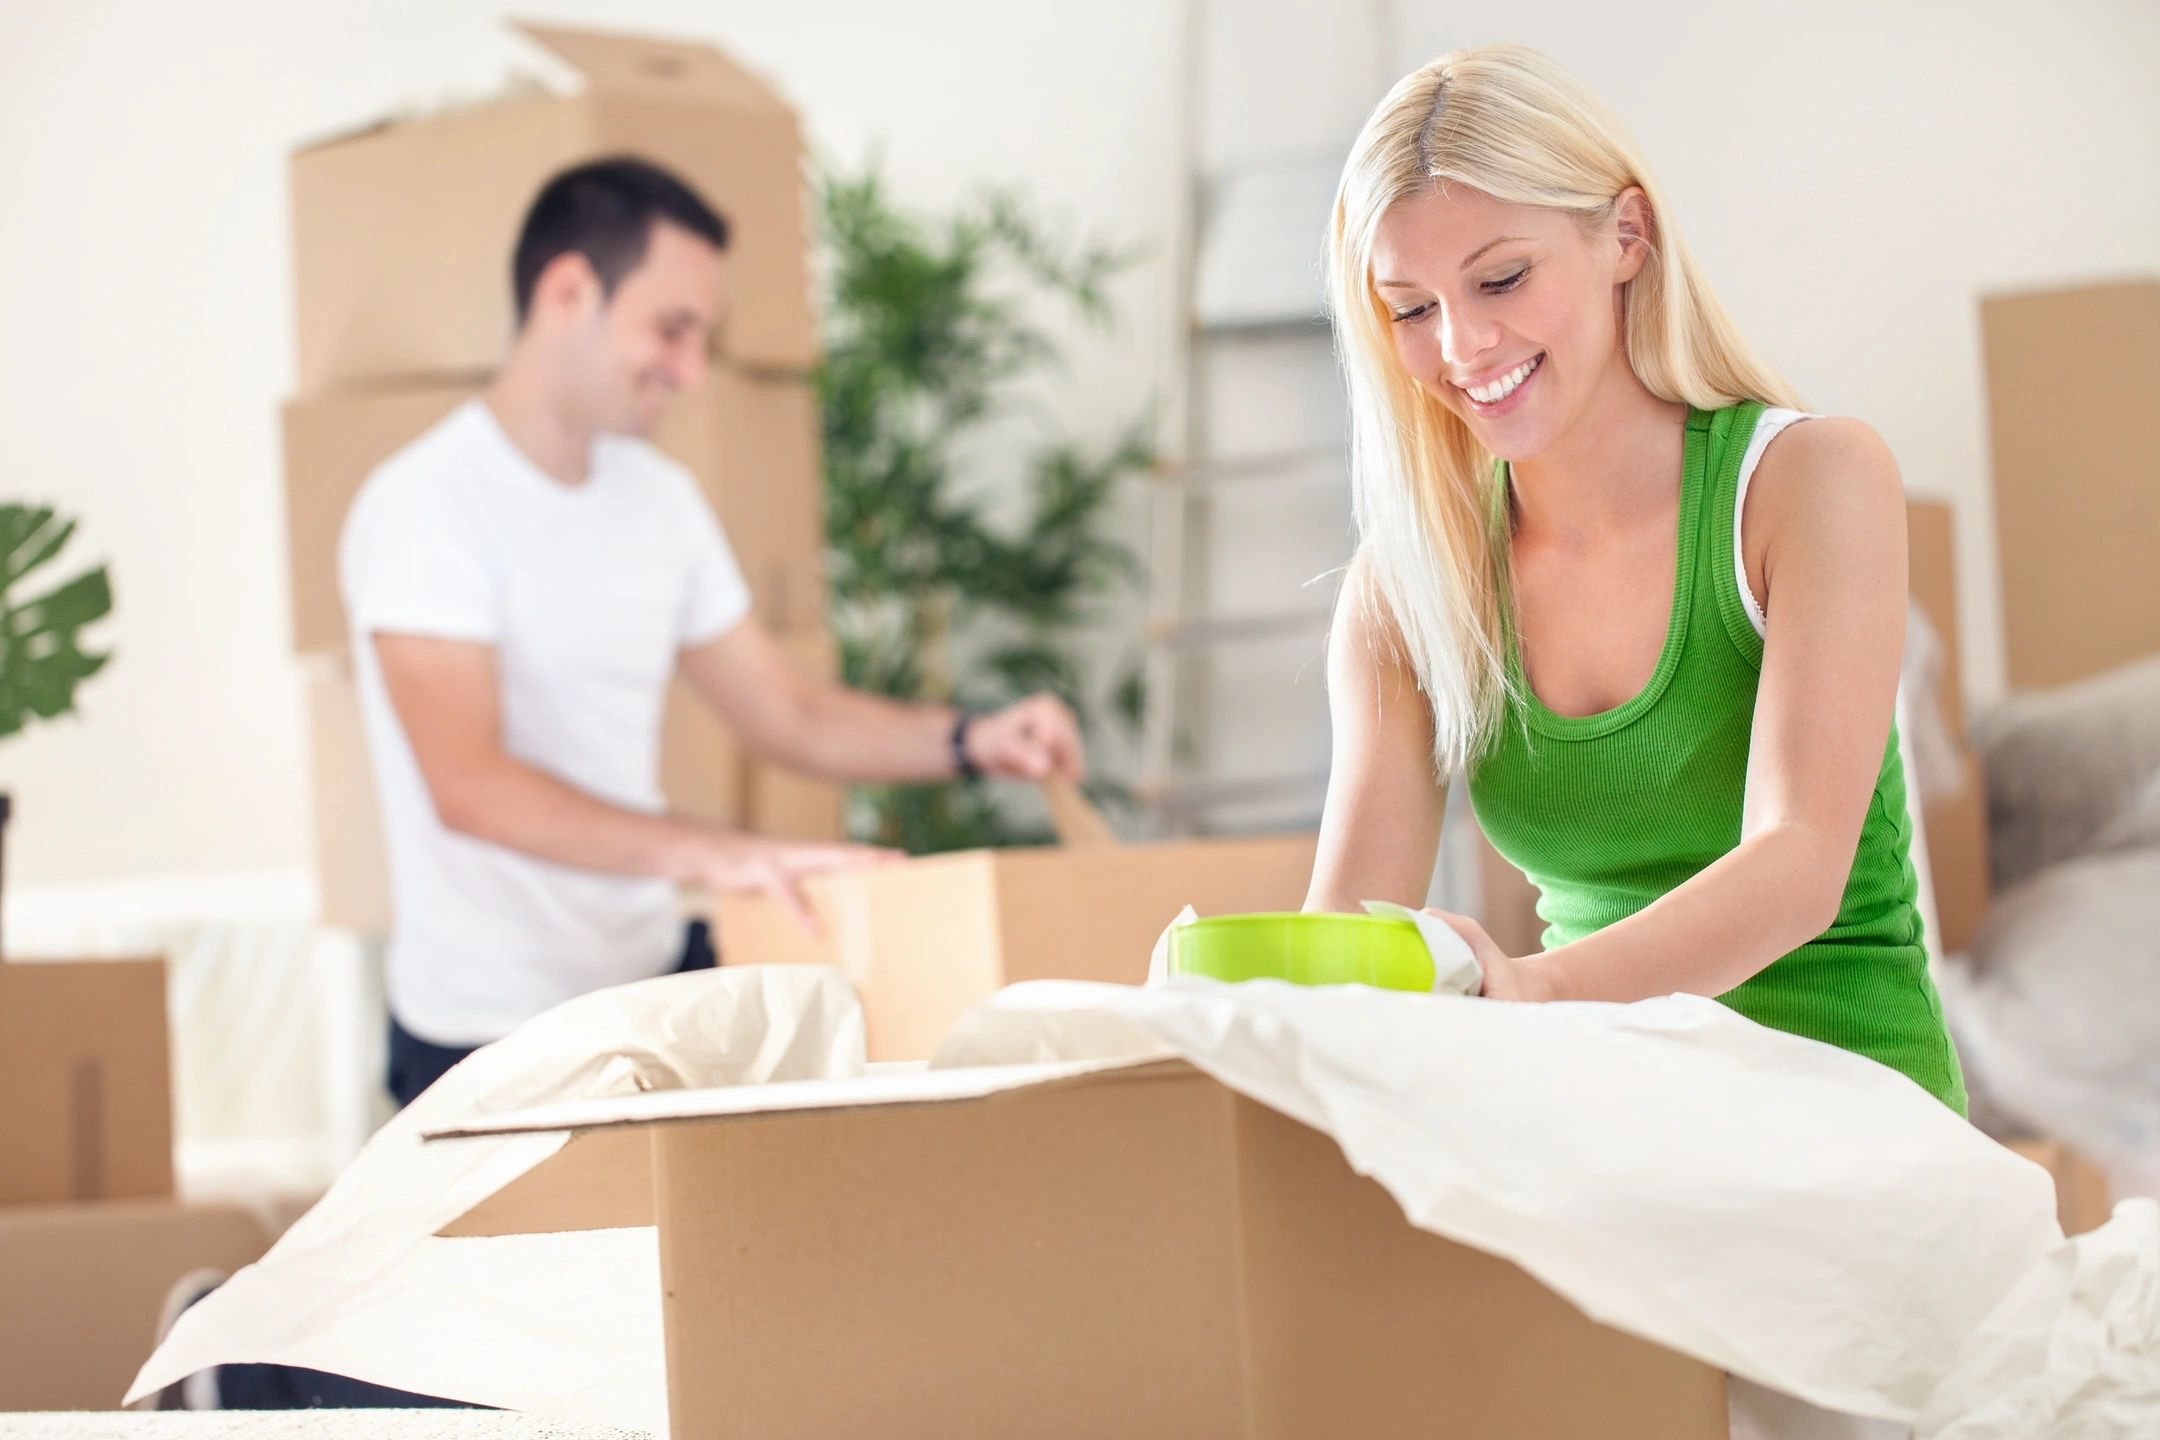 White Box Mobile Storage - Storage, Moving, Storage Units